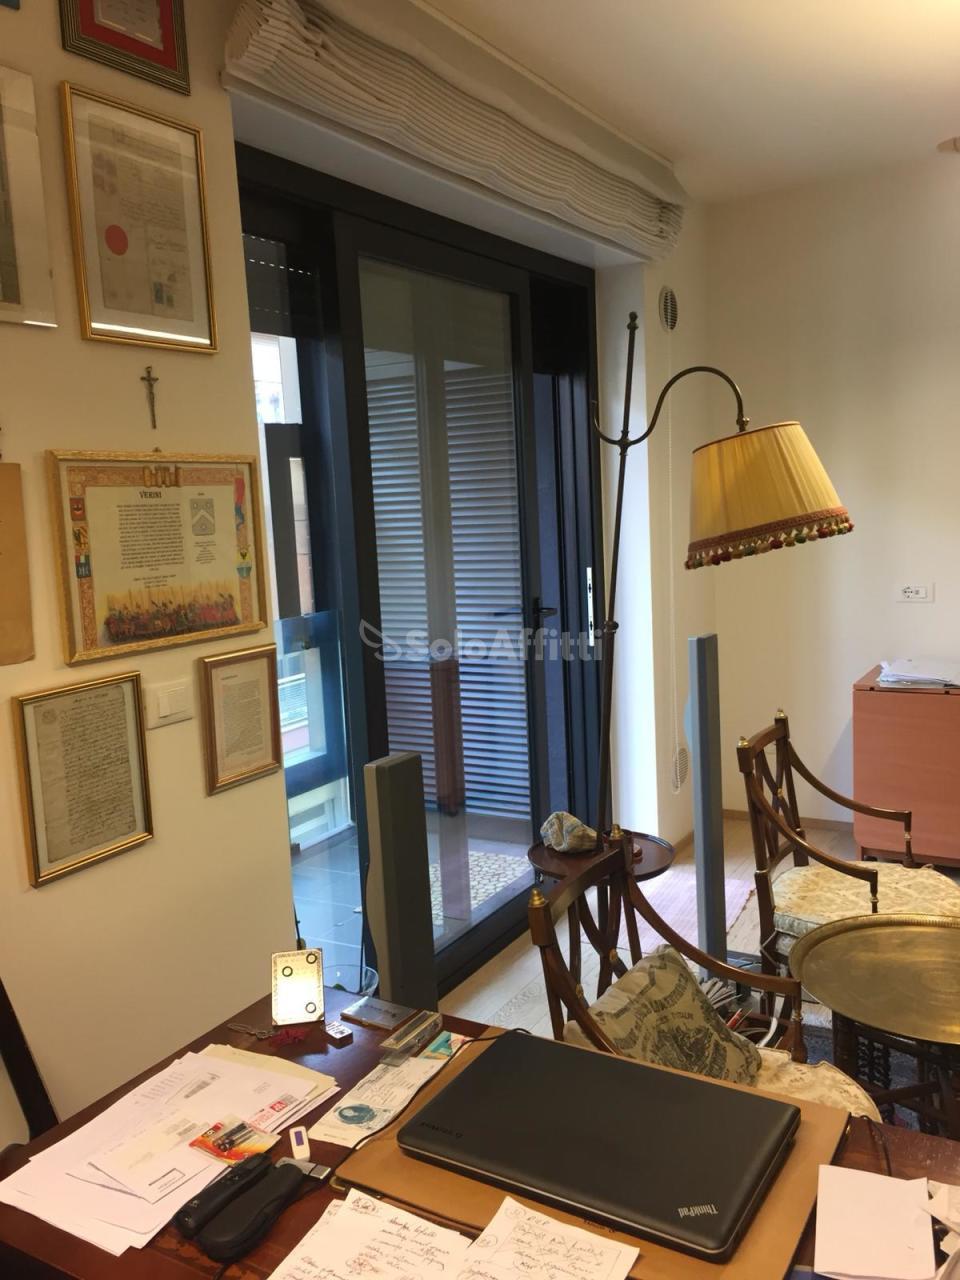 Appartamento - Bilocale a Corso Vittorio Emanuele, Pescara